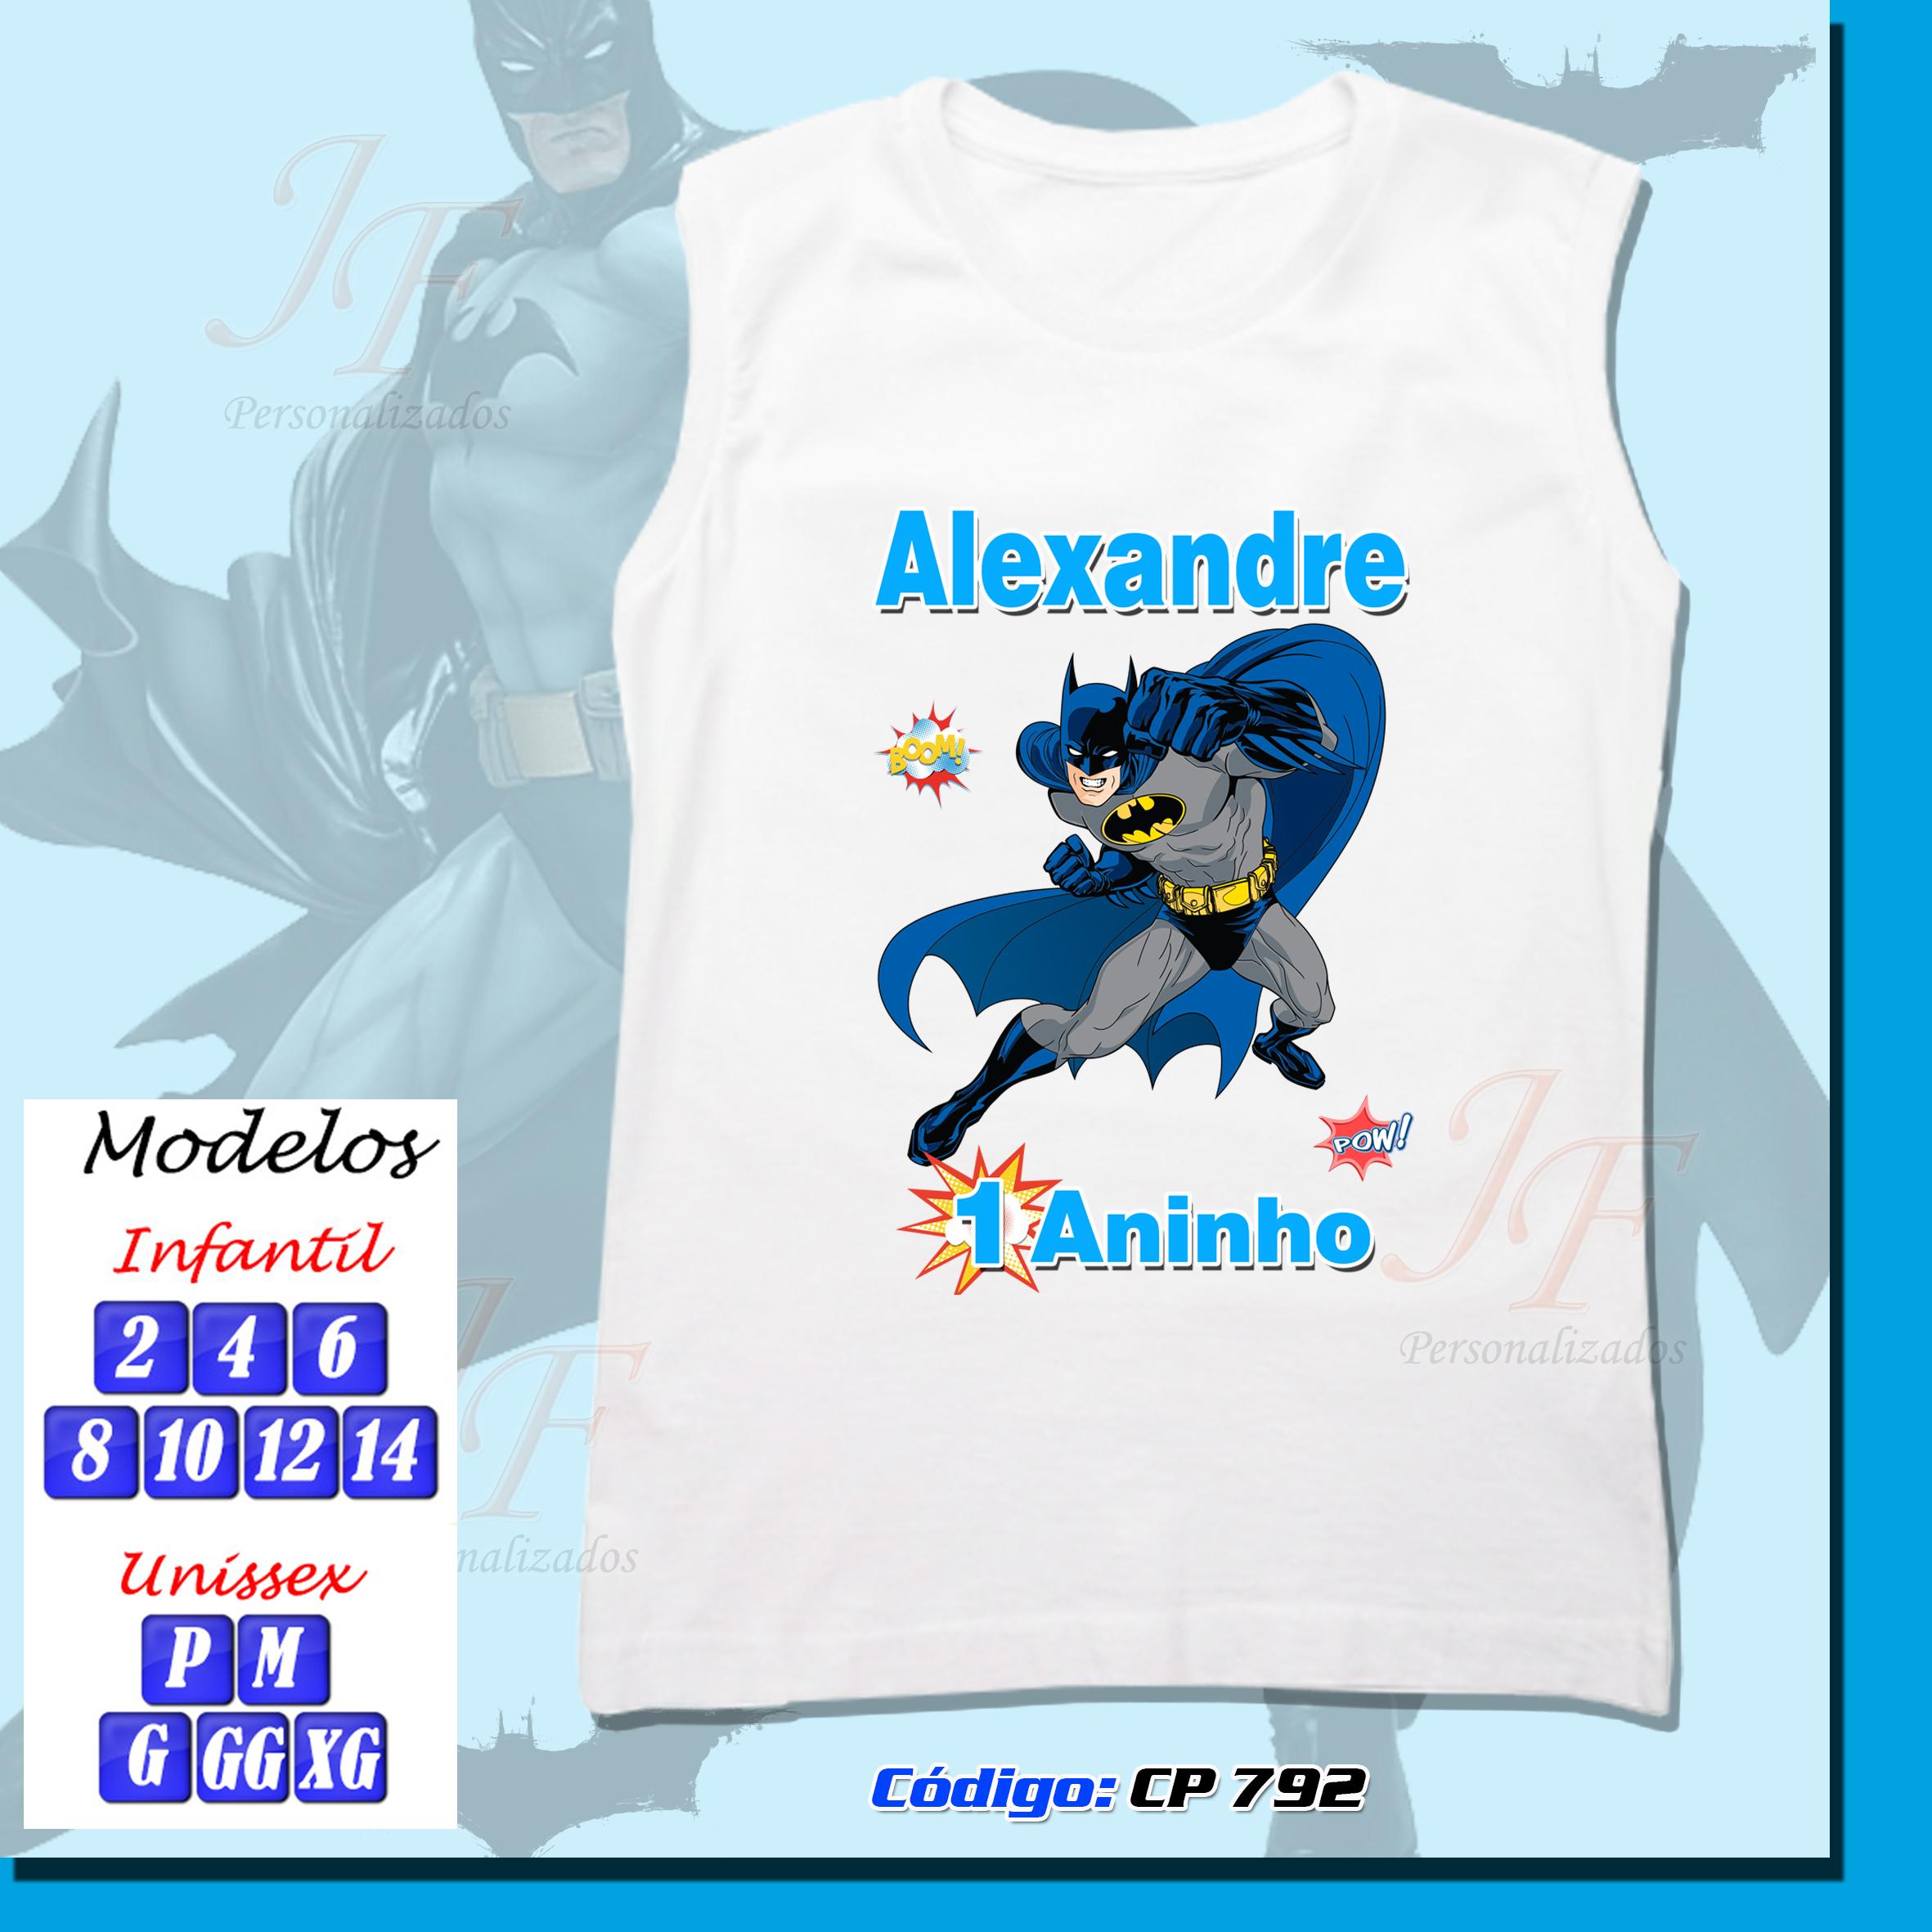 Camisetas para Machos  6c822daa7ec